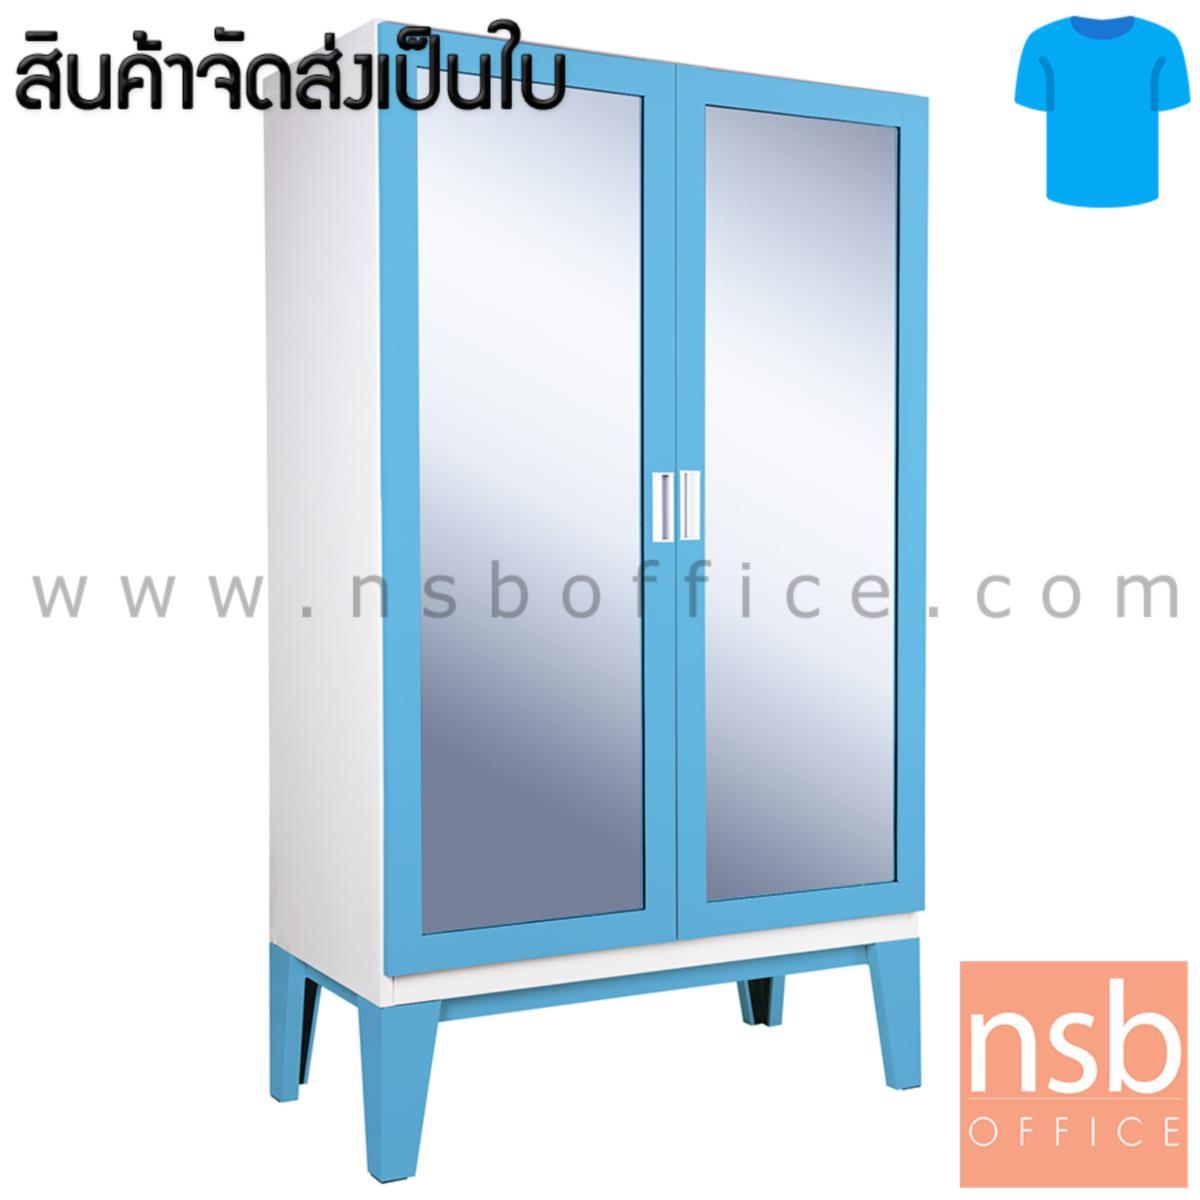 E25A020:ตู้เสื้อผ้า 2 บานเปิดกระจกสูง 200H cm. ขาลอย รุ่น WD-02